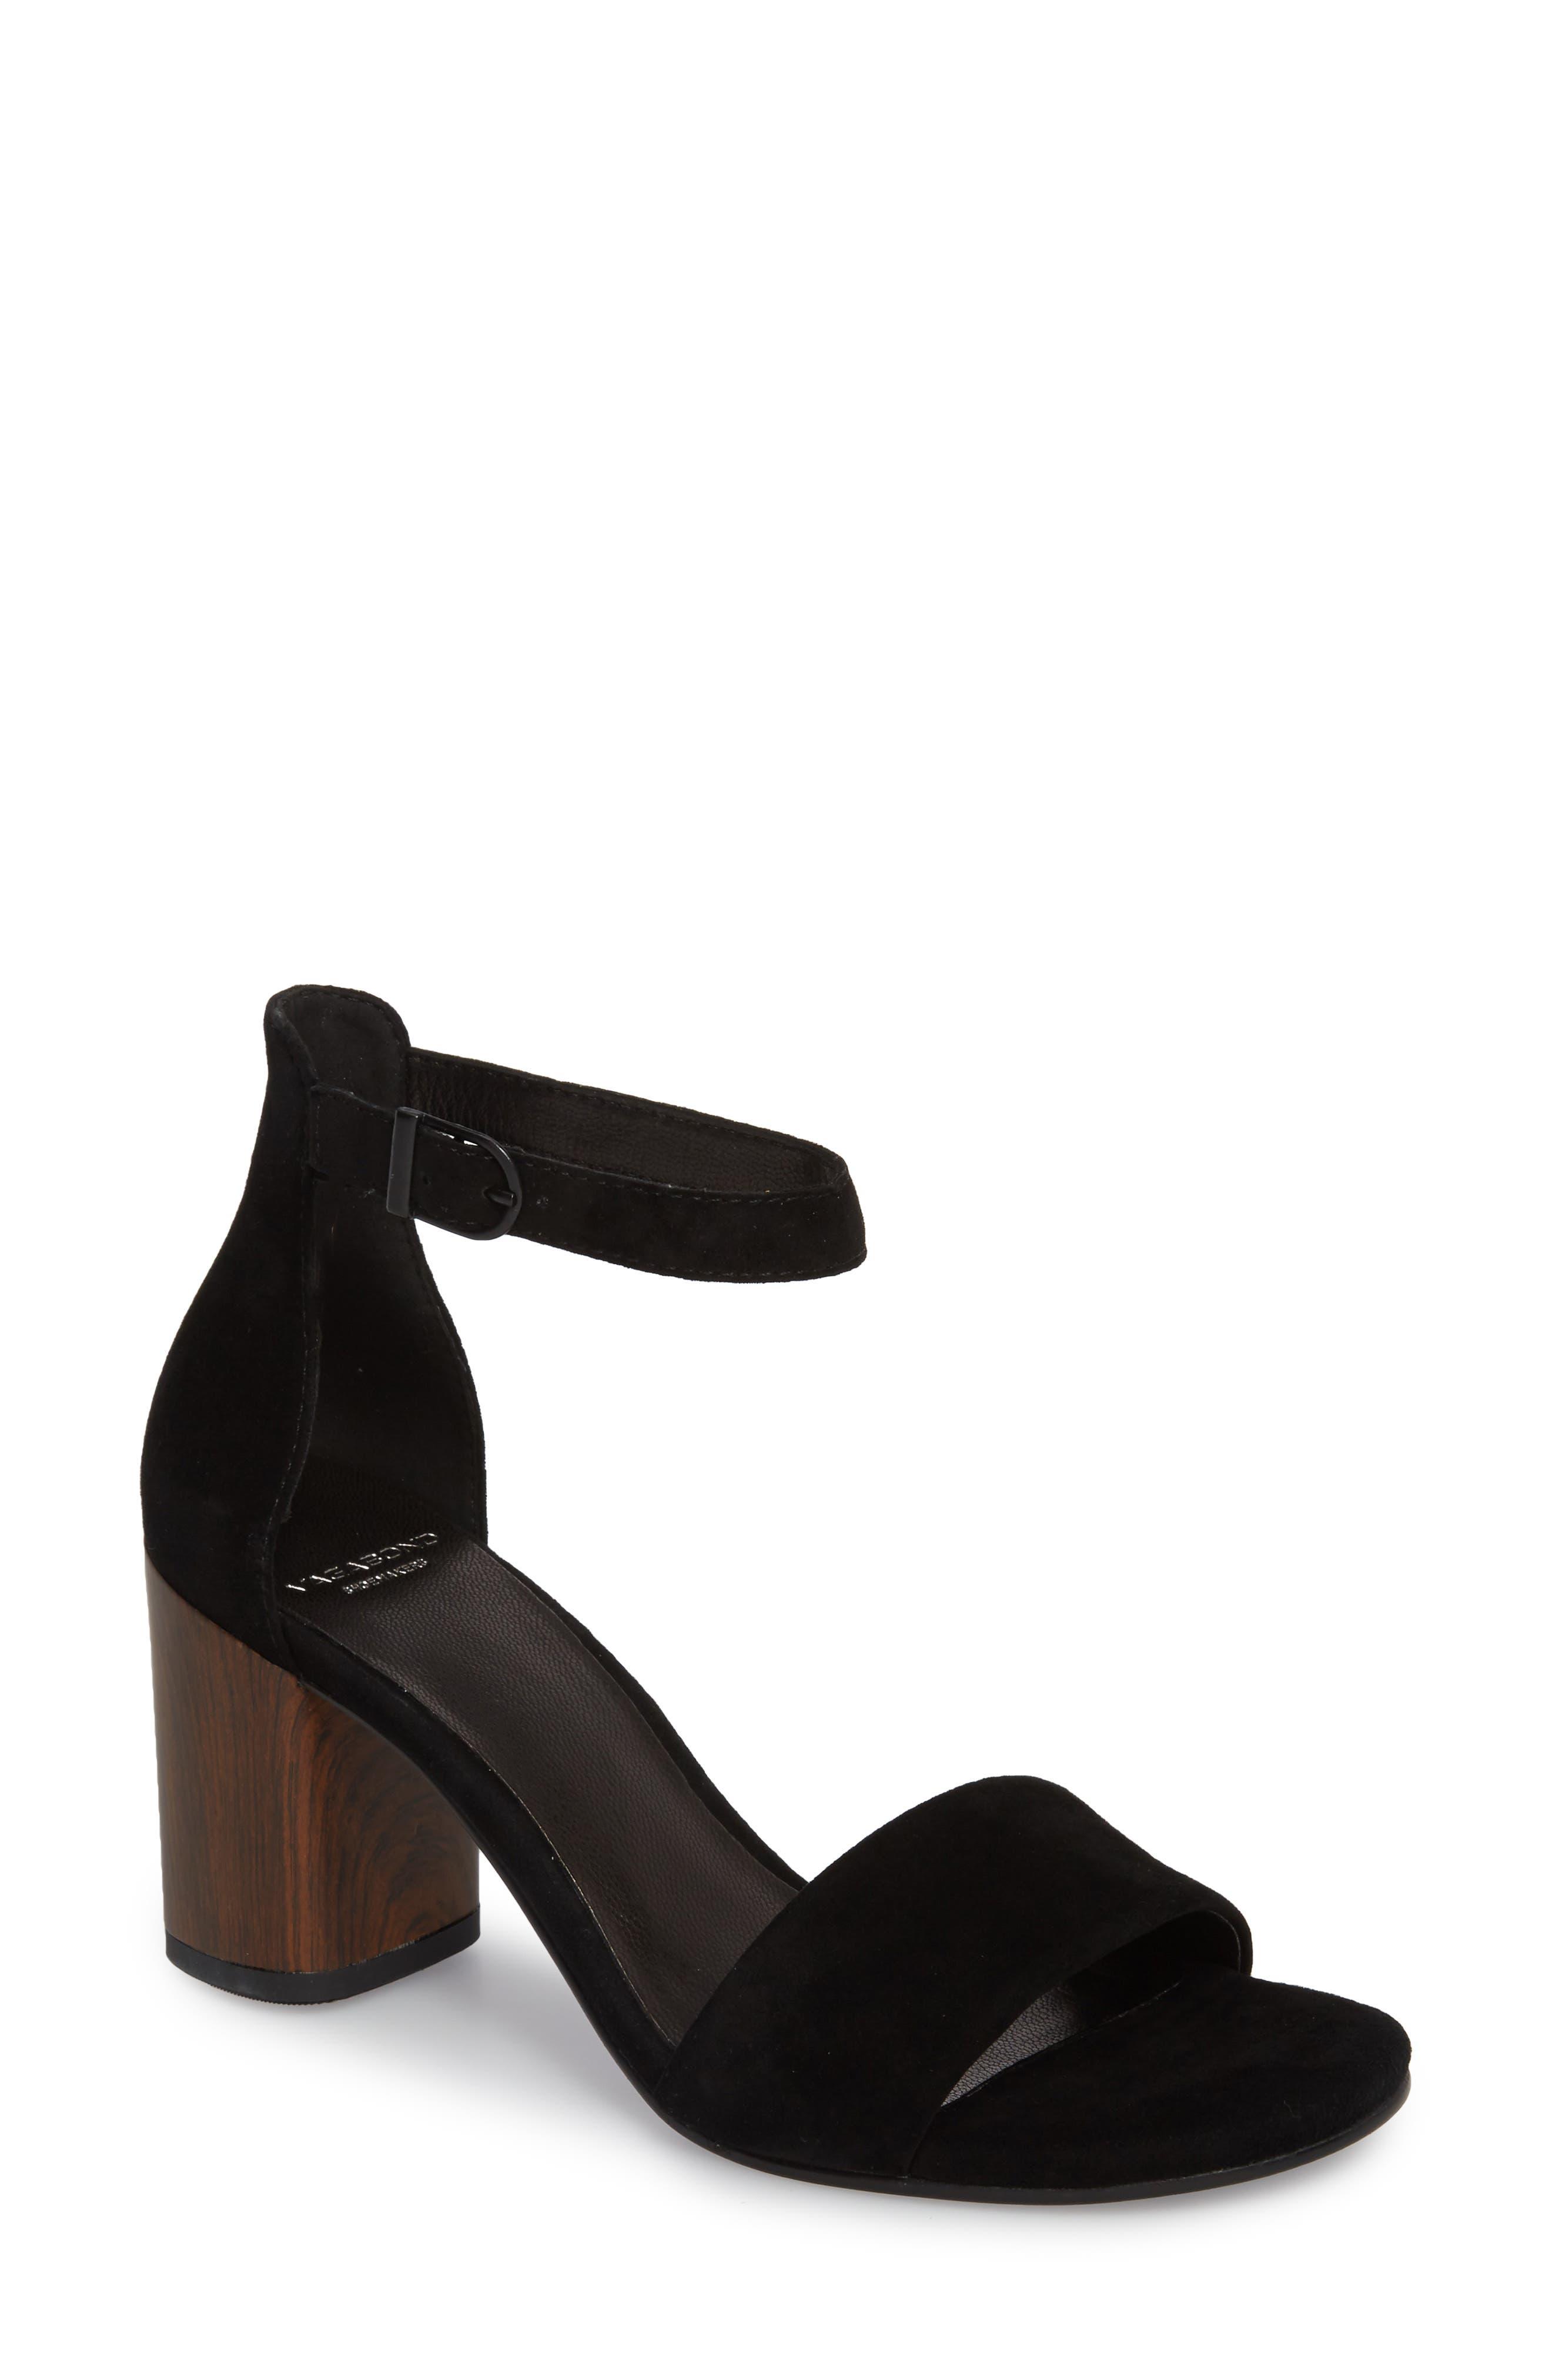 Vagabond Shoemakers Carol Ankle Strap Sandal, Black